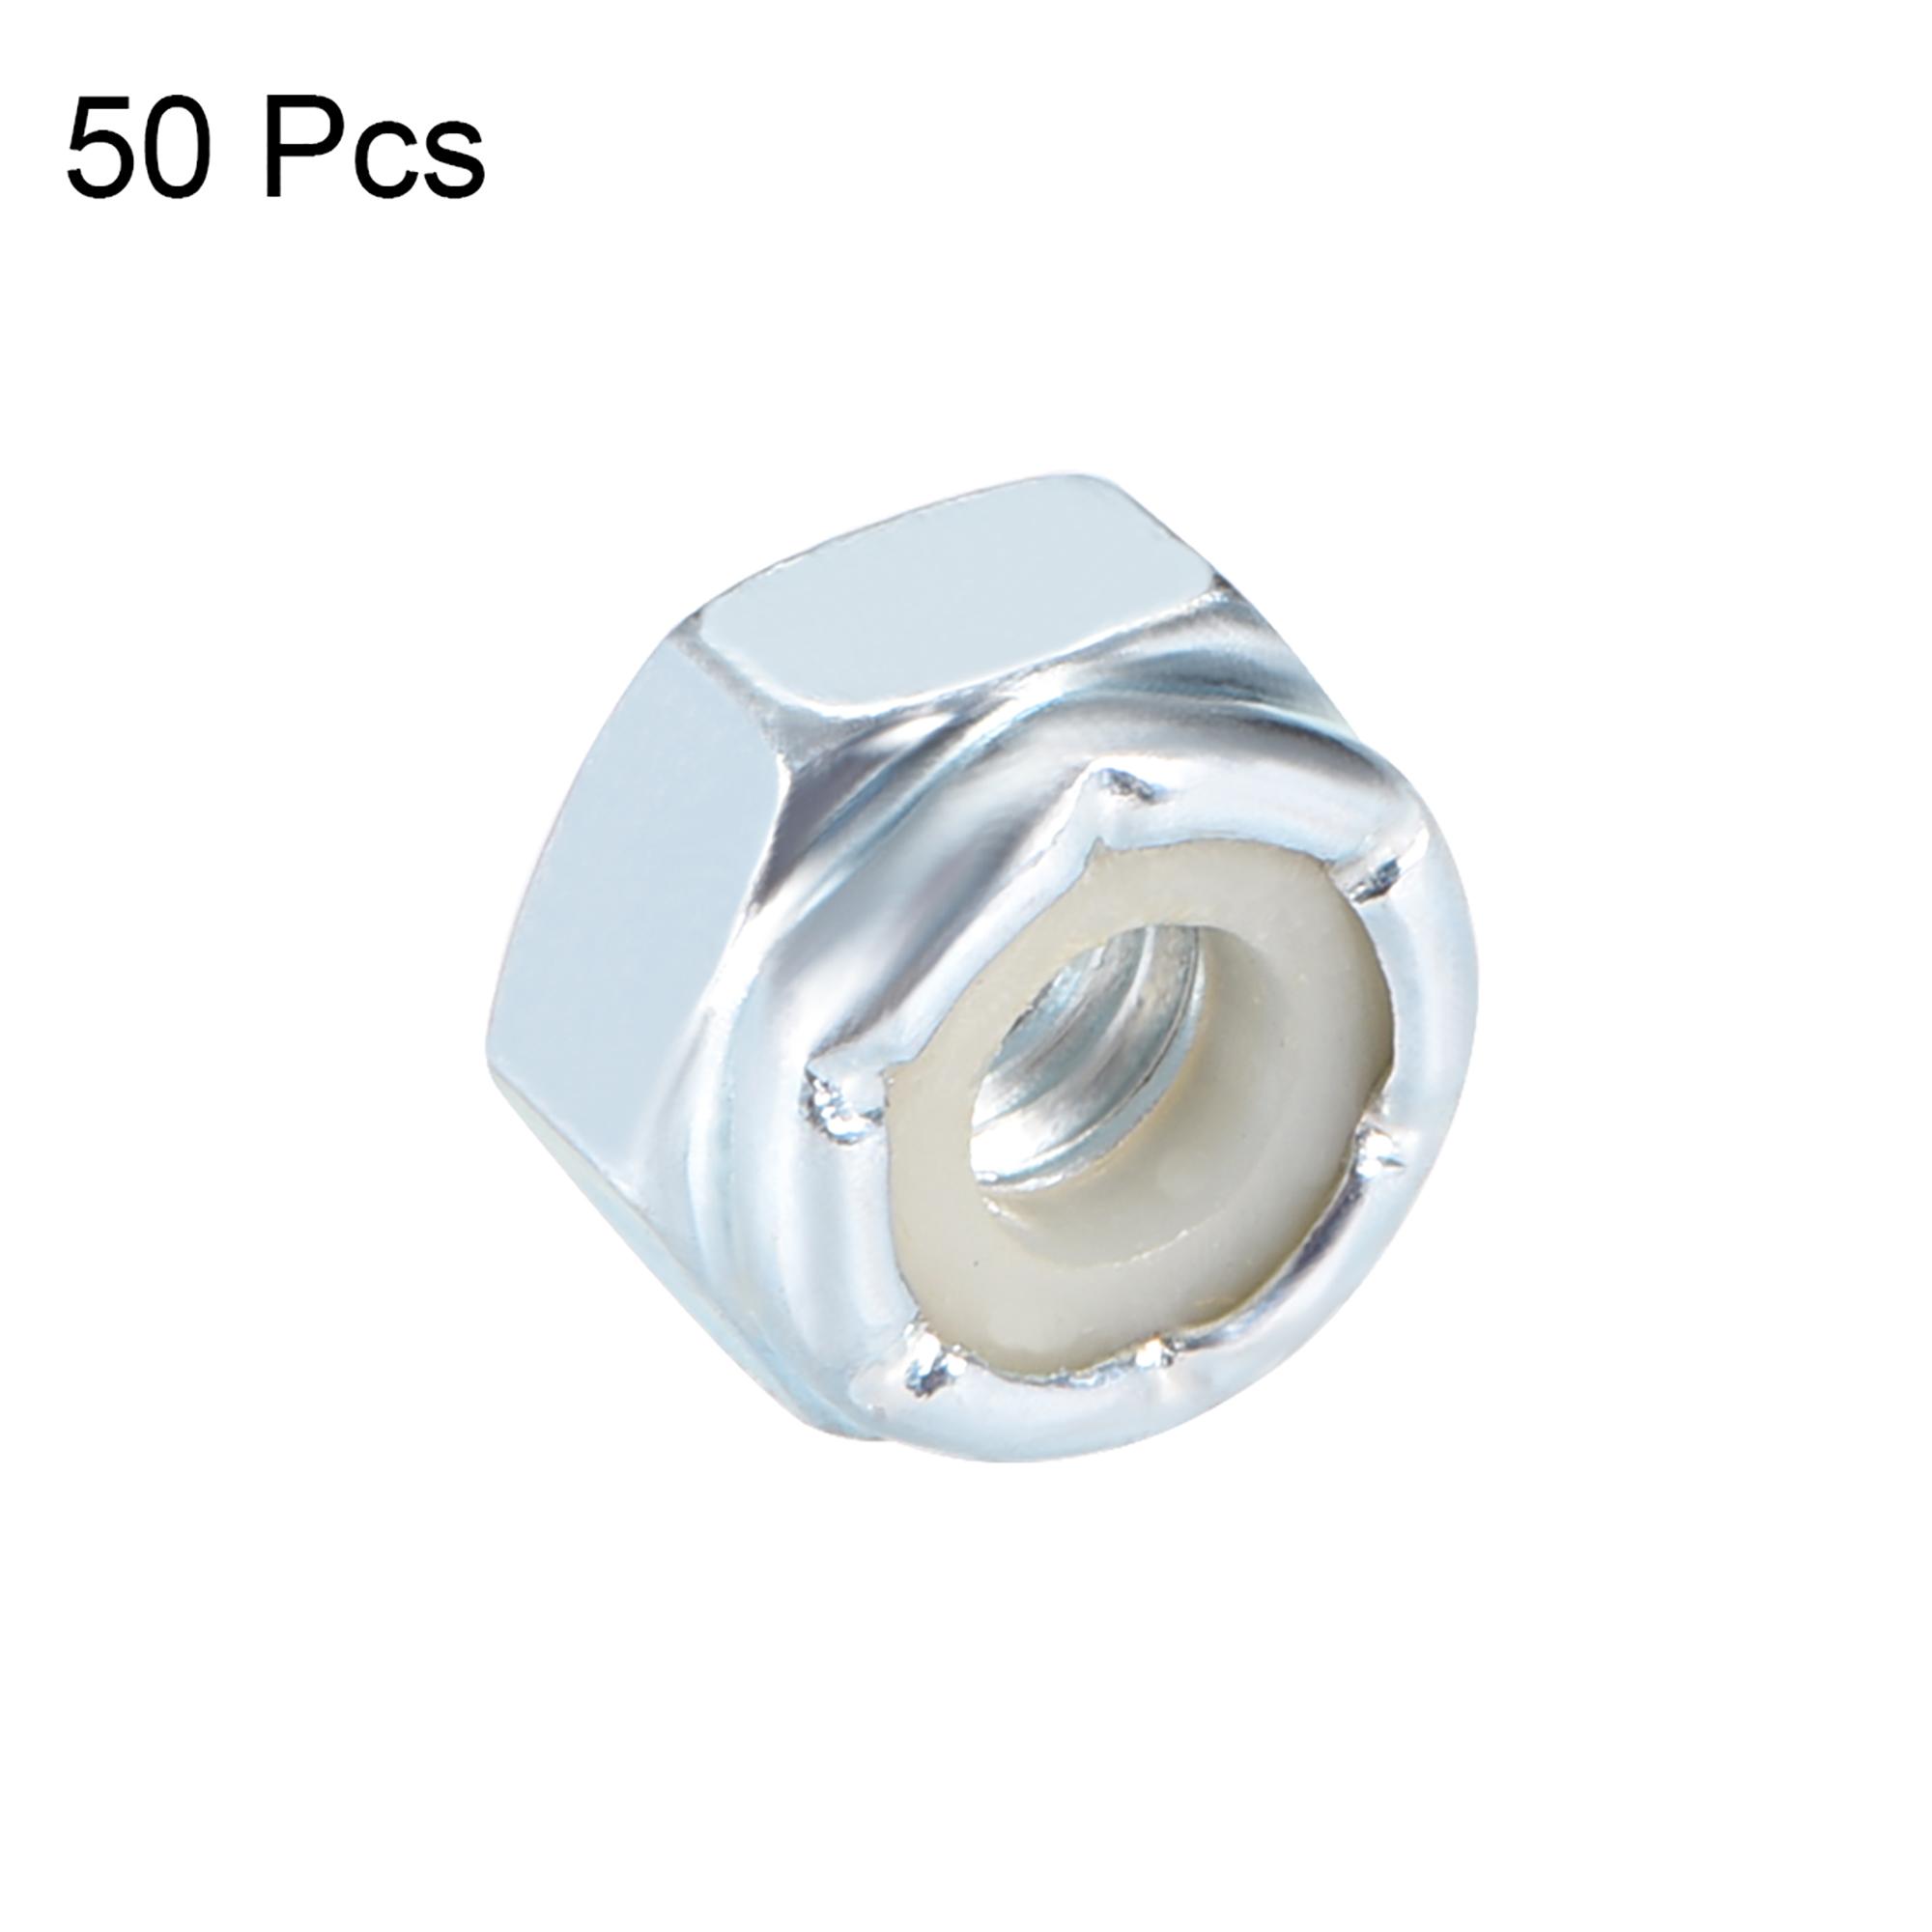 10#-24 Nylon Insert Hex Lock Nuts, Carbon Steel White Zinc Plated, 50 Pcs - image 1 de 3